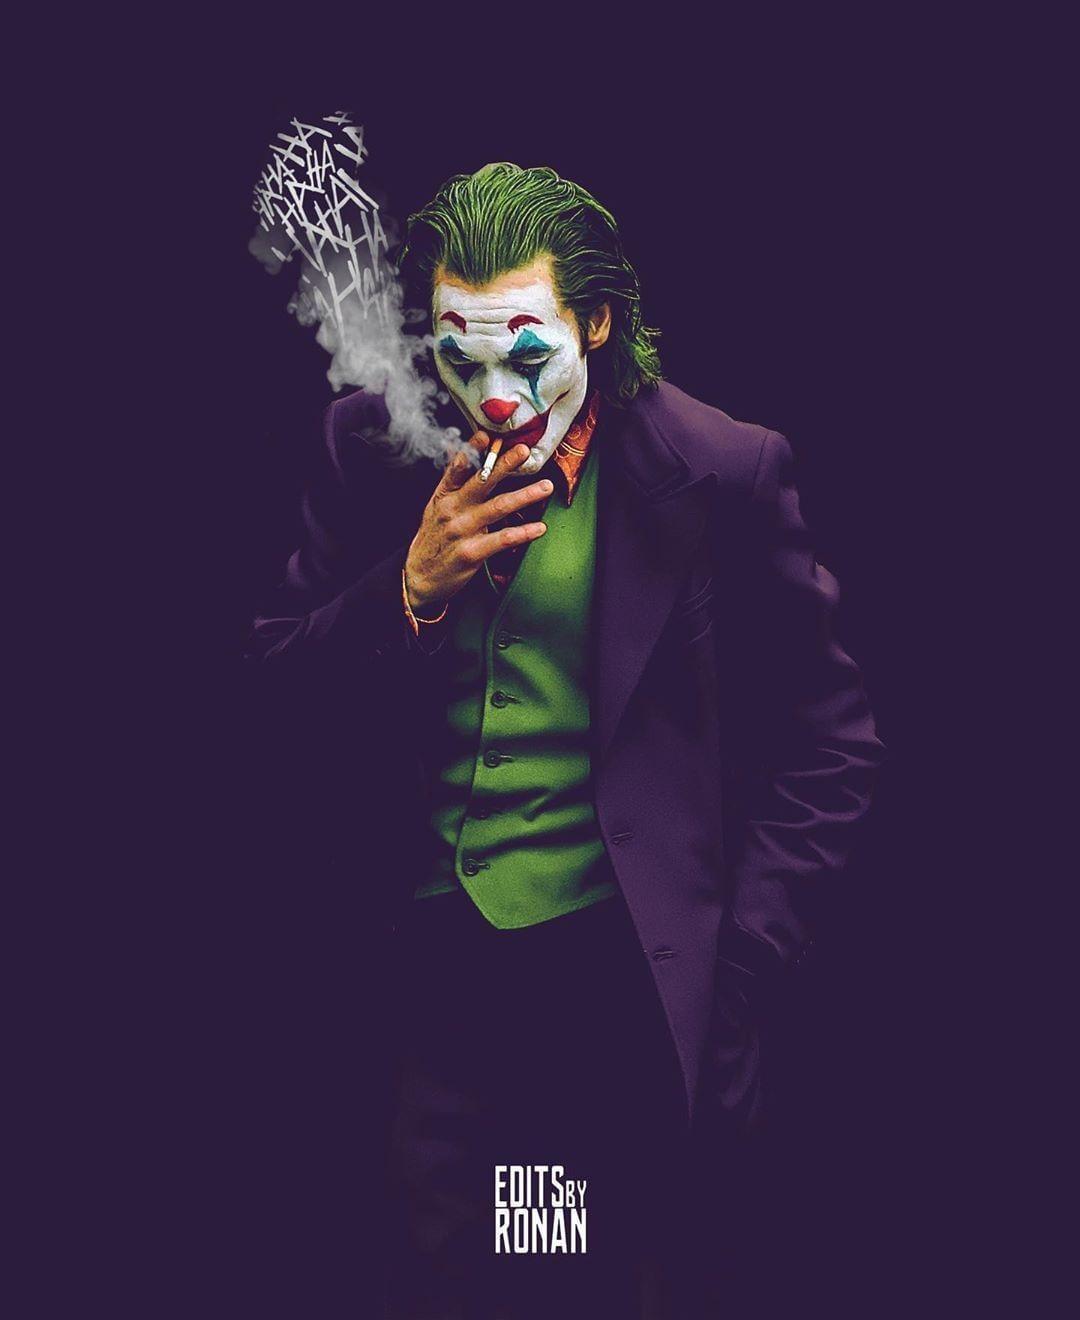 Joker Batman Thejoker Joaquinphoenix Claridouradinha Jokerquotes Jokermemes Jokermemes Batman Joker Wallpaper Joker Iphone Wallpaper Joker Wallpapers